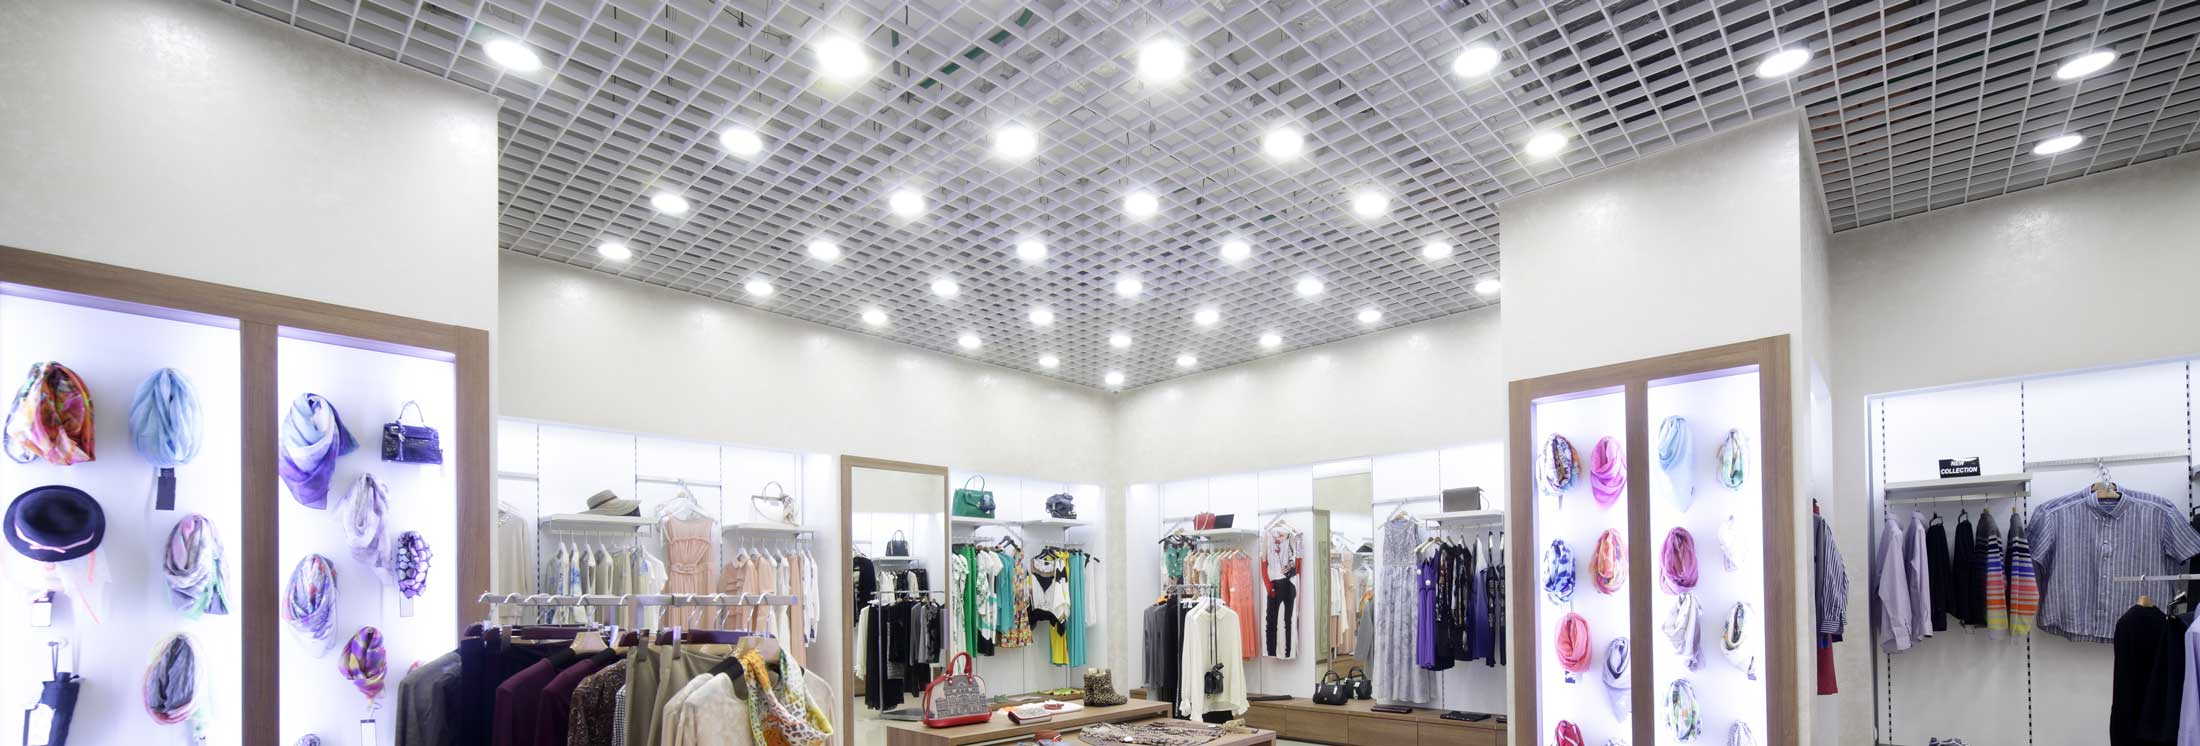 Lighting for Retail Shops   Supply & Installation - LED UK